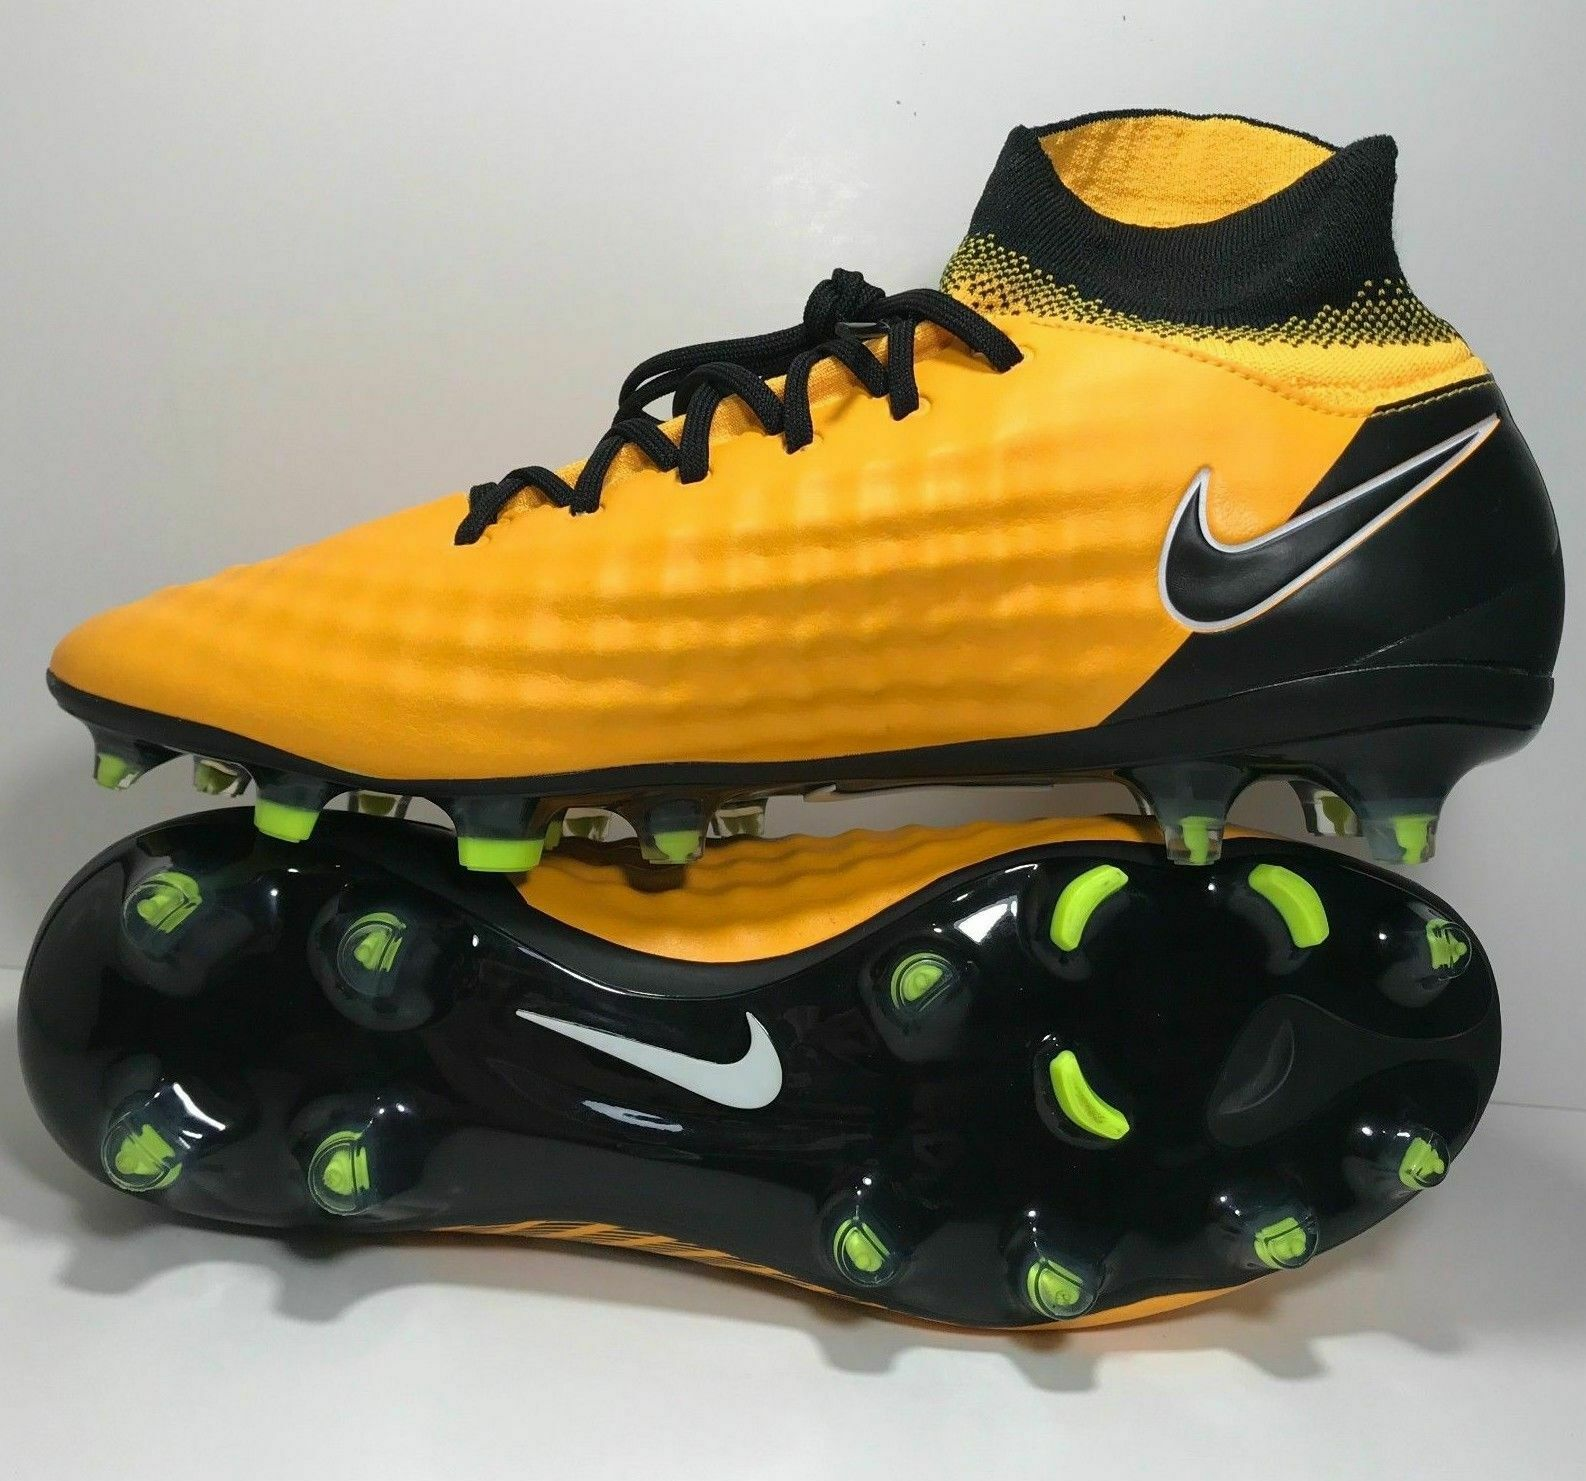 NIKE FOOTBALL: Besticke Deinen Schuh! | Public Relations (PR